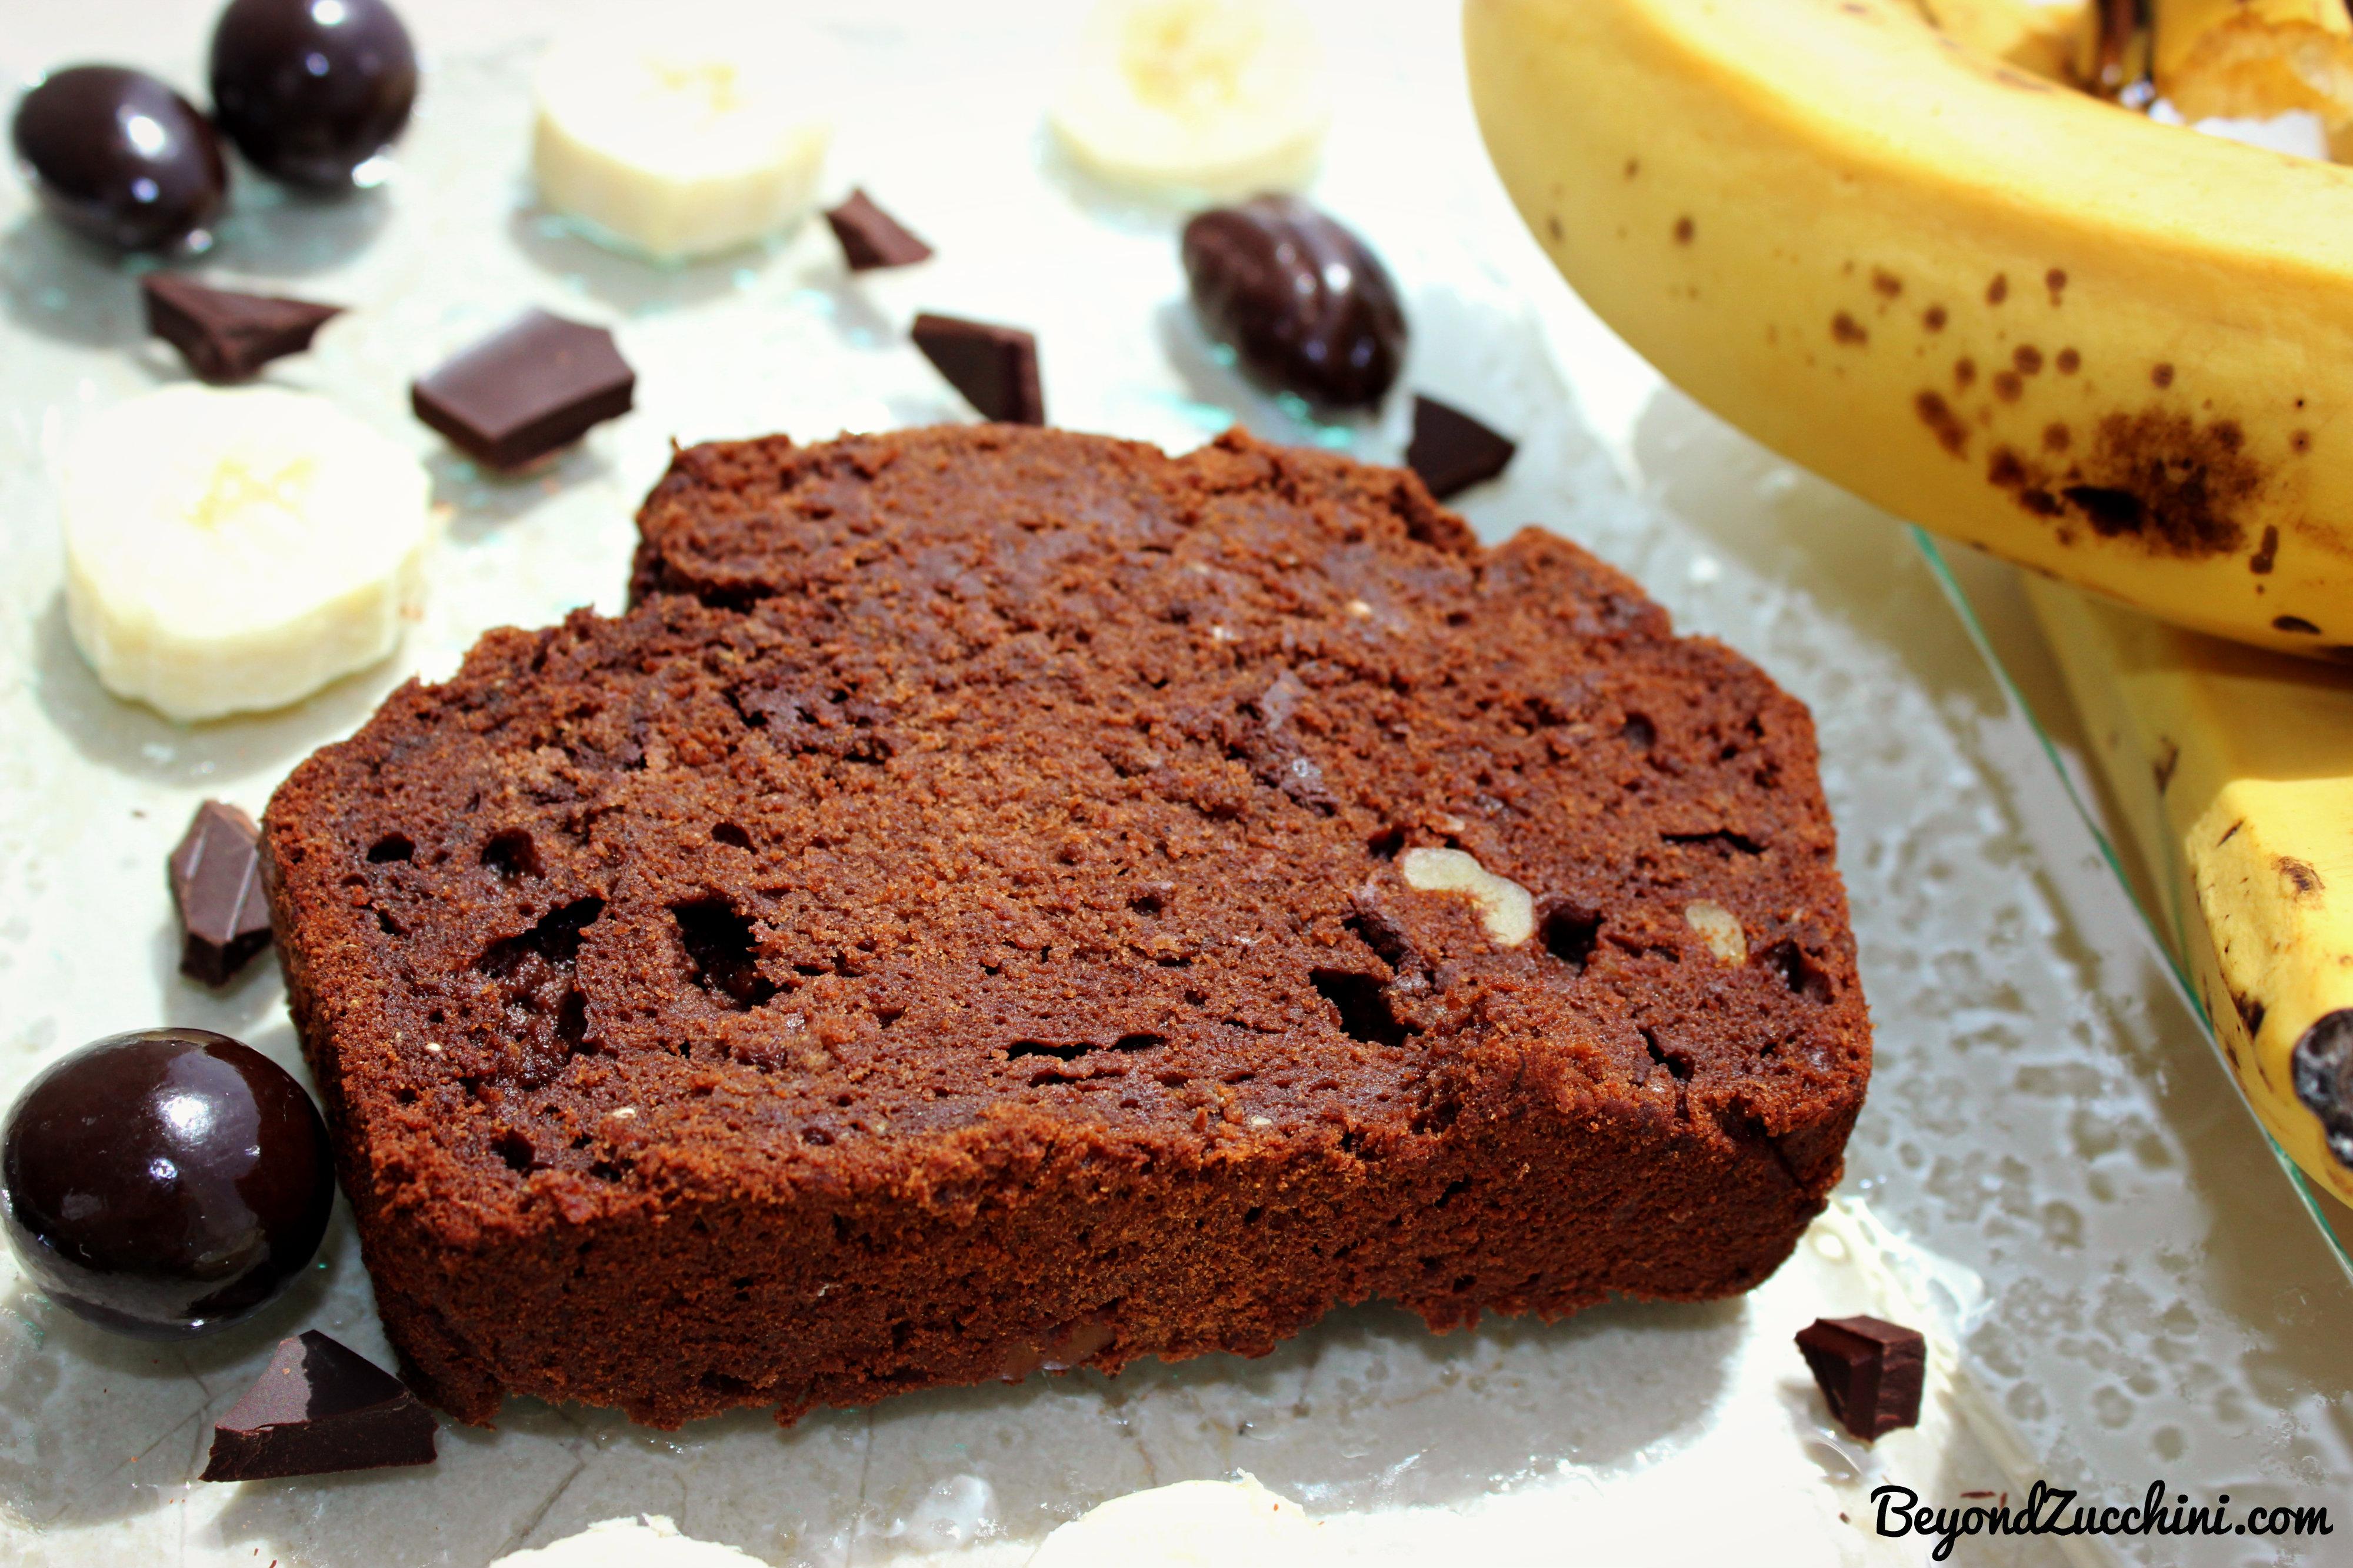 Chocolate Banana Bread (Gluten-free, dairy-free, no added ...